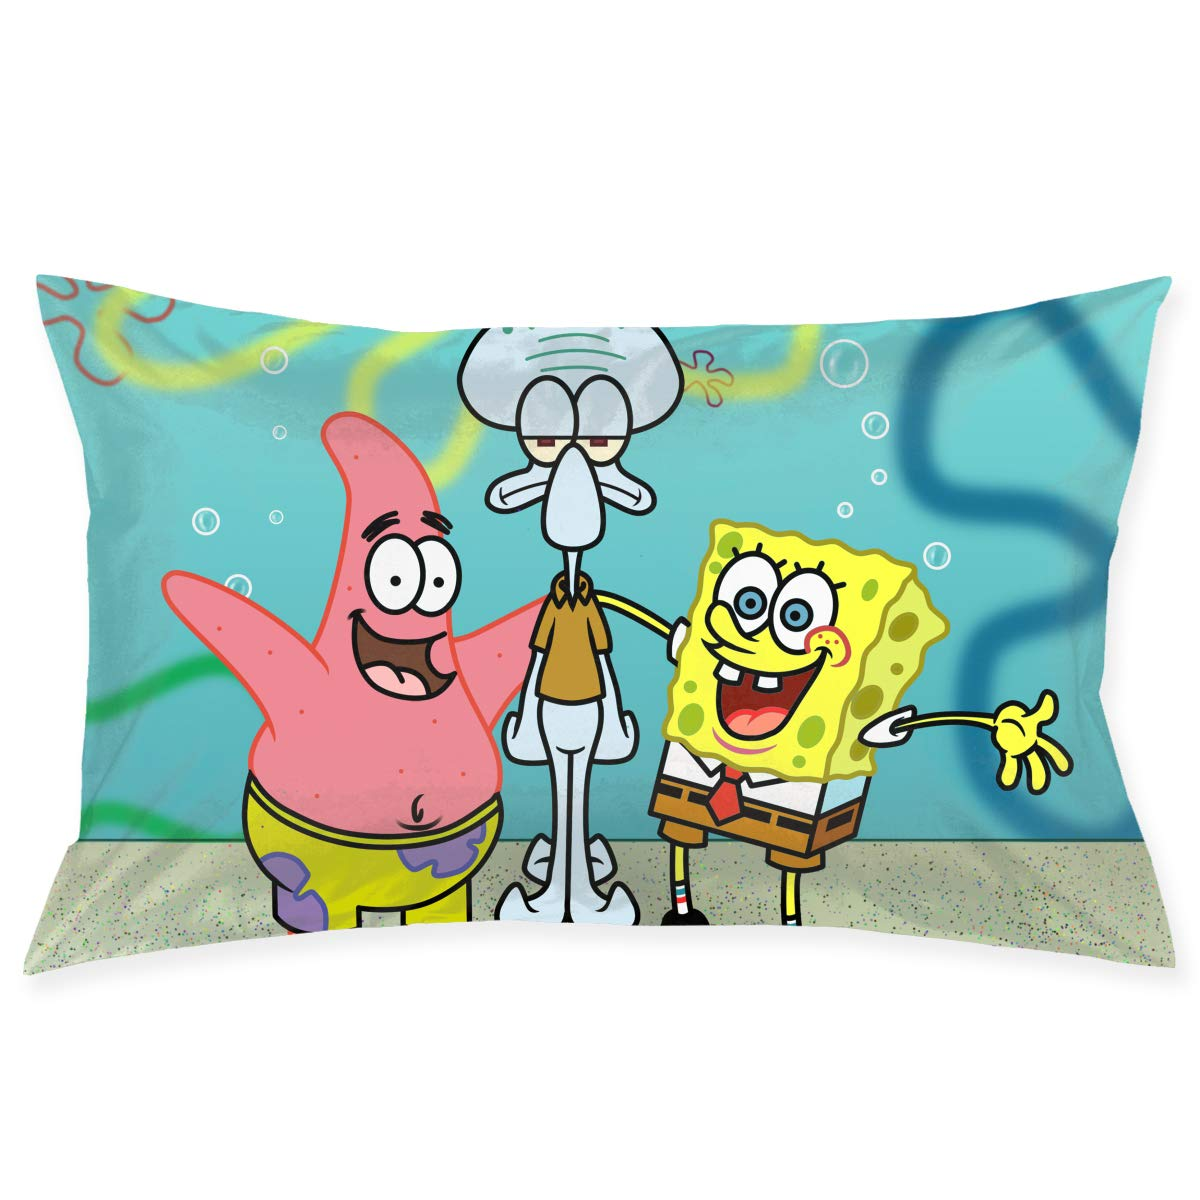 Meirdre Pillow Cases Spongebob